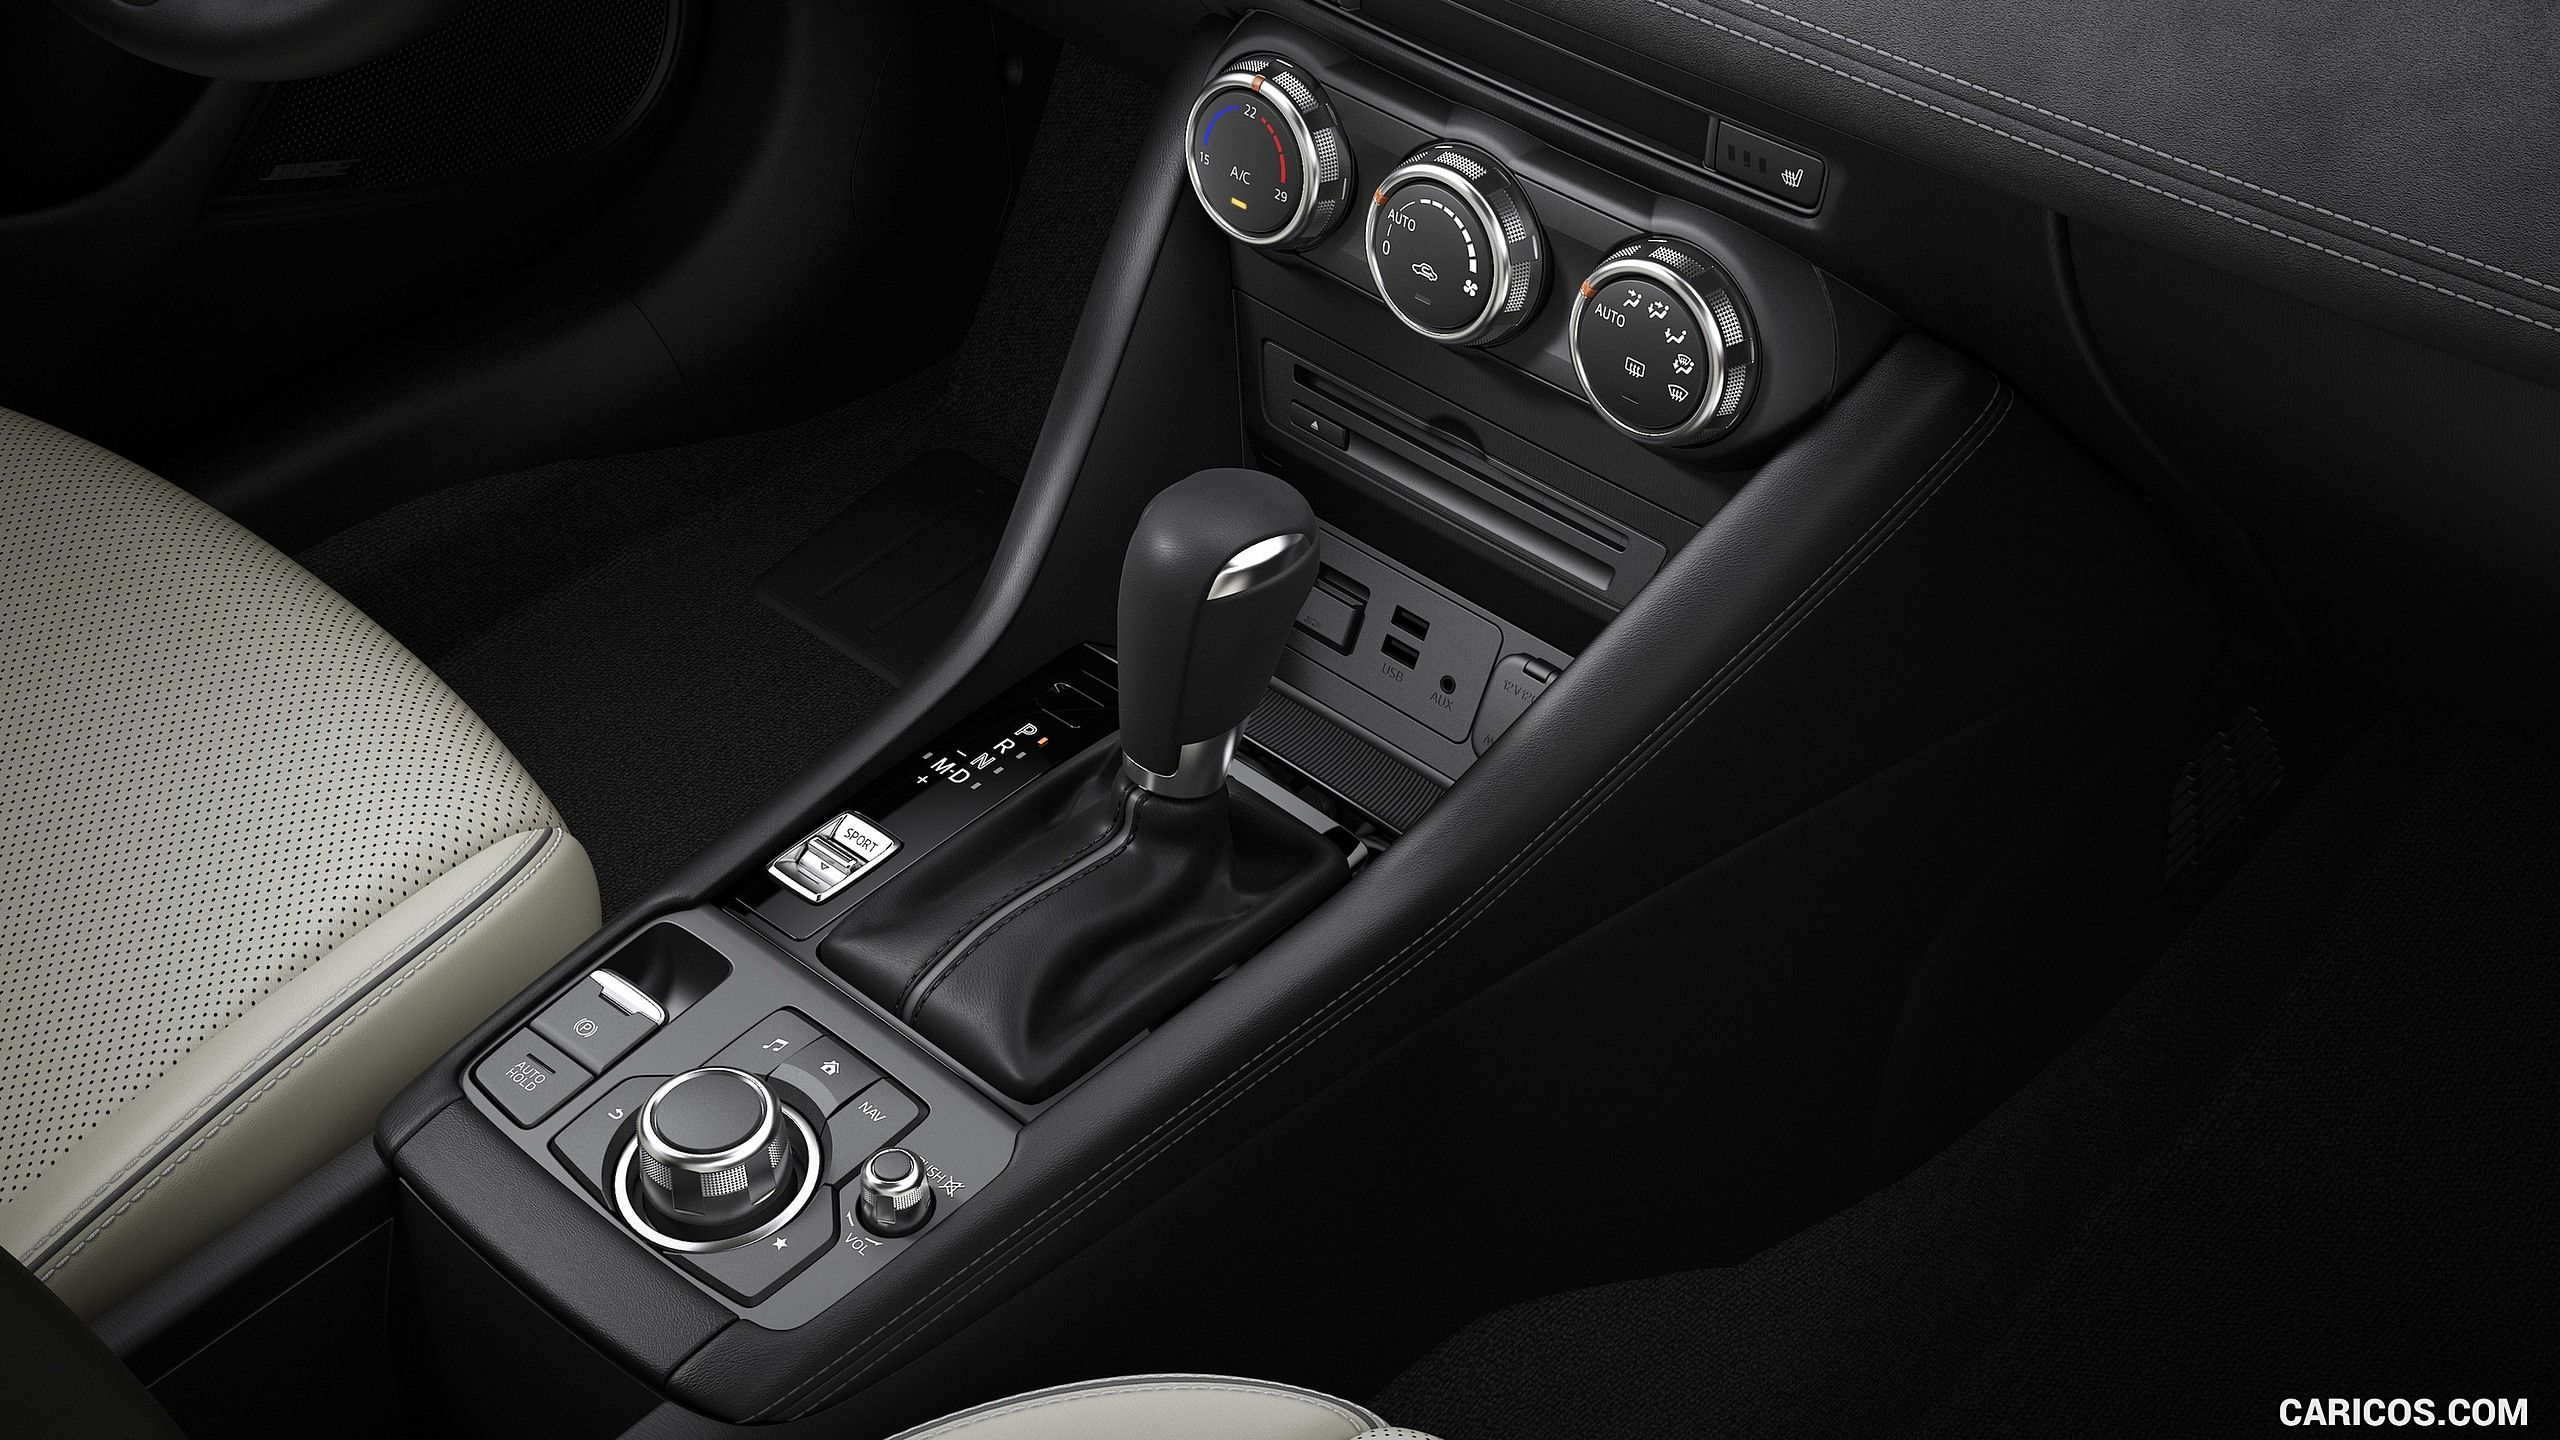 2019 Mazda Cx 3 Interior Car Review 2018 All Car Reviews